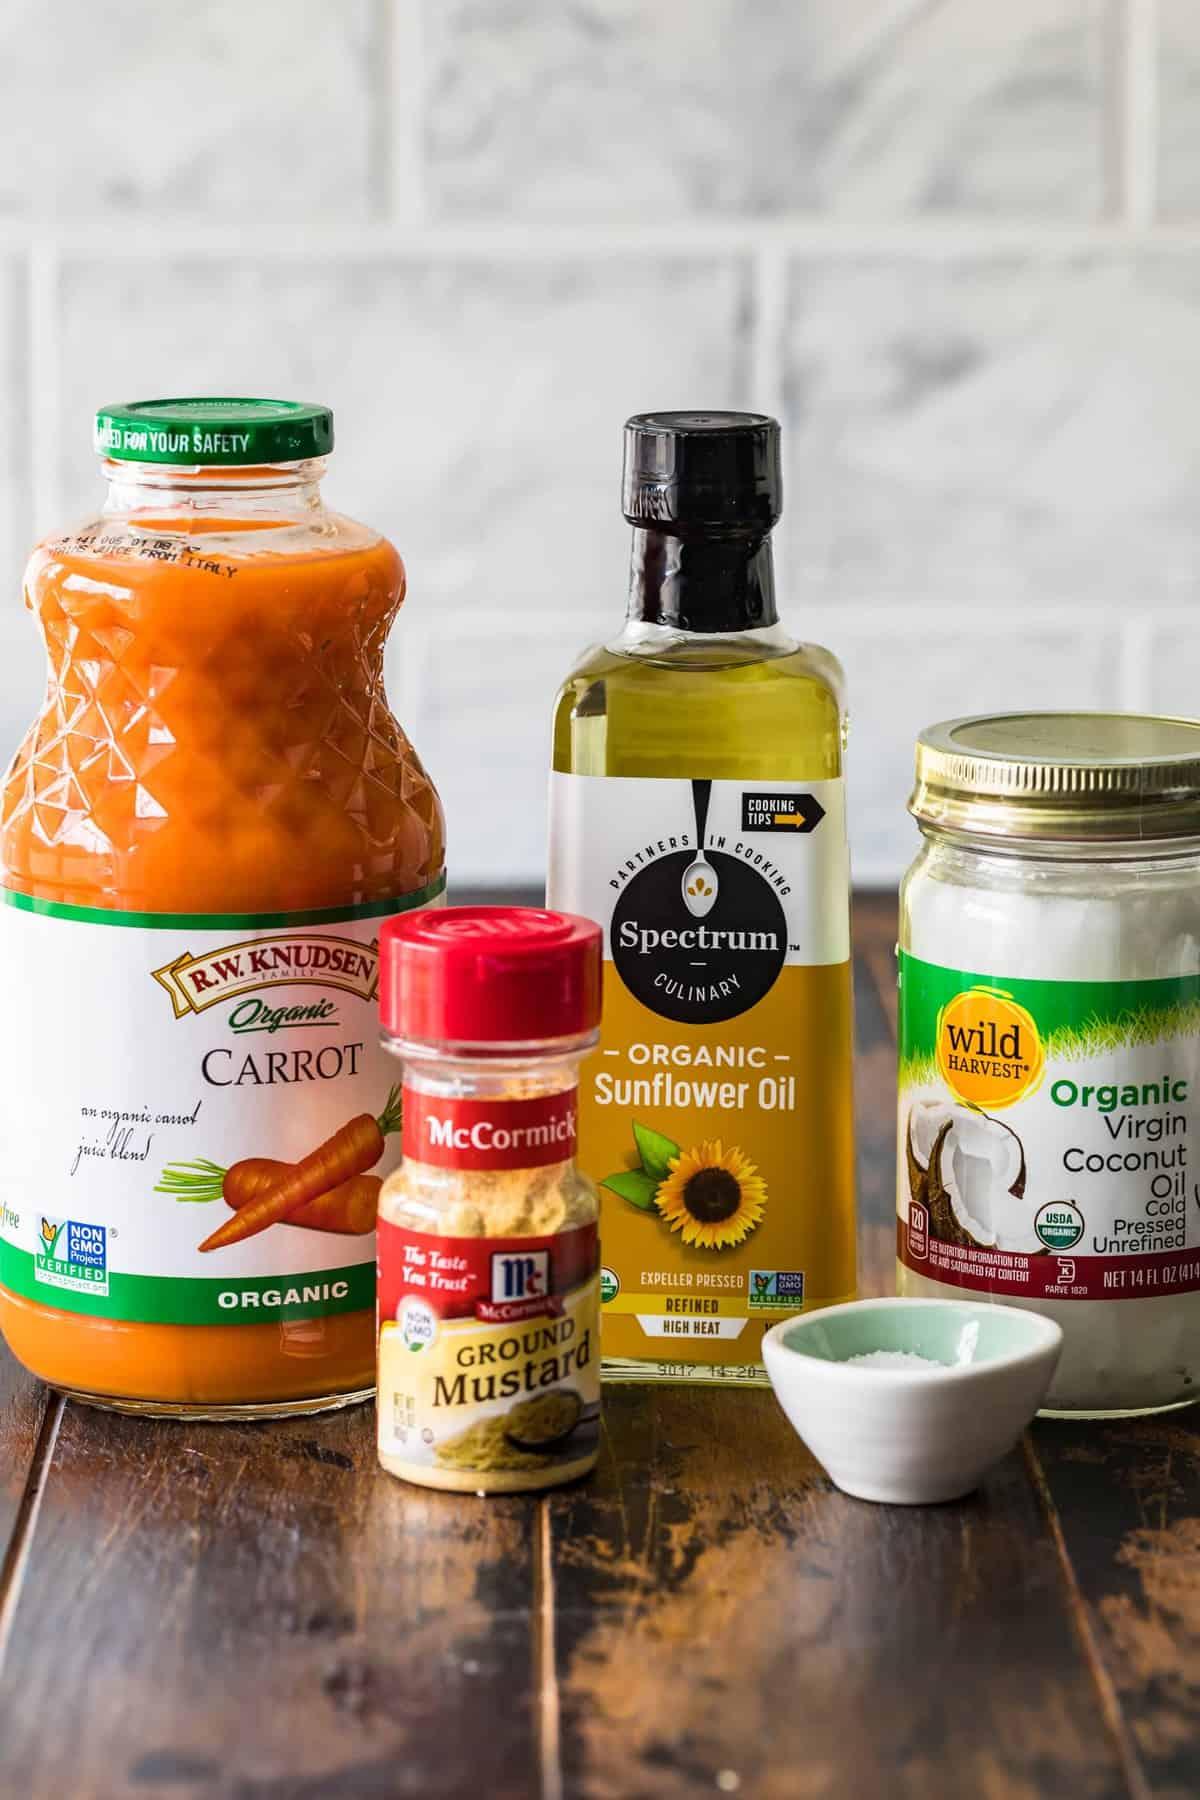 ingredients for making vegan butter